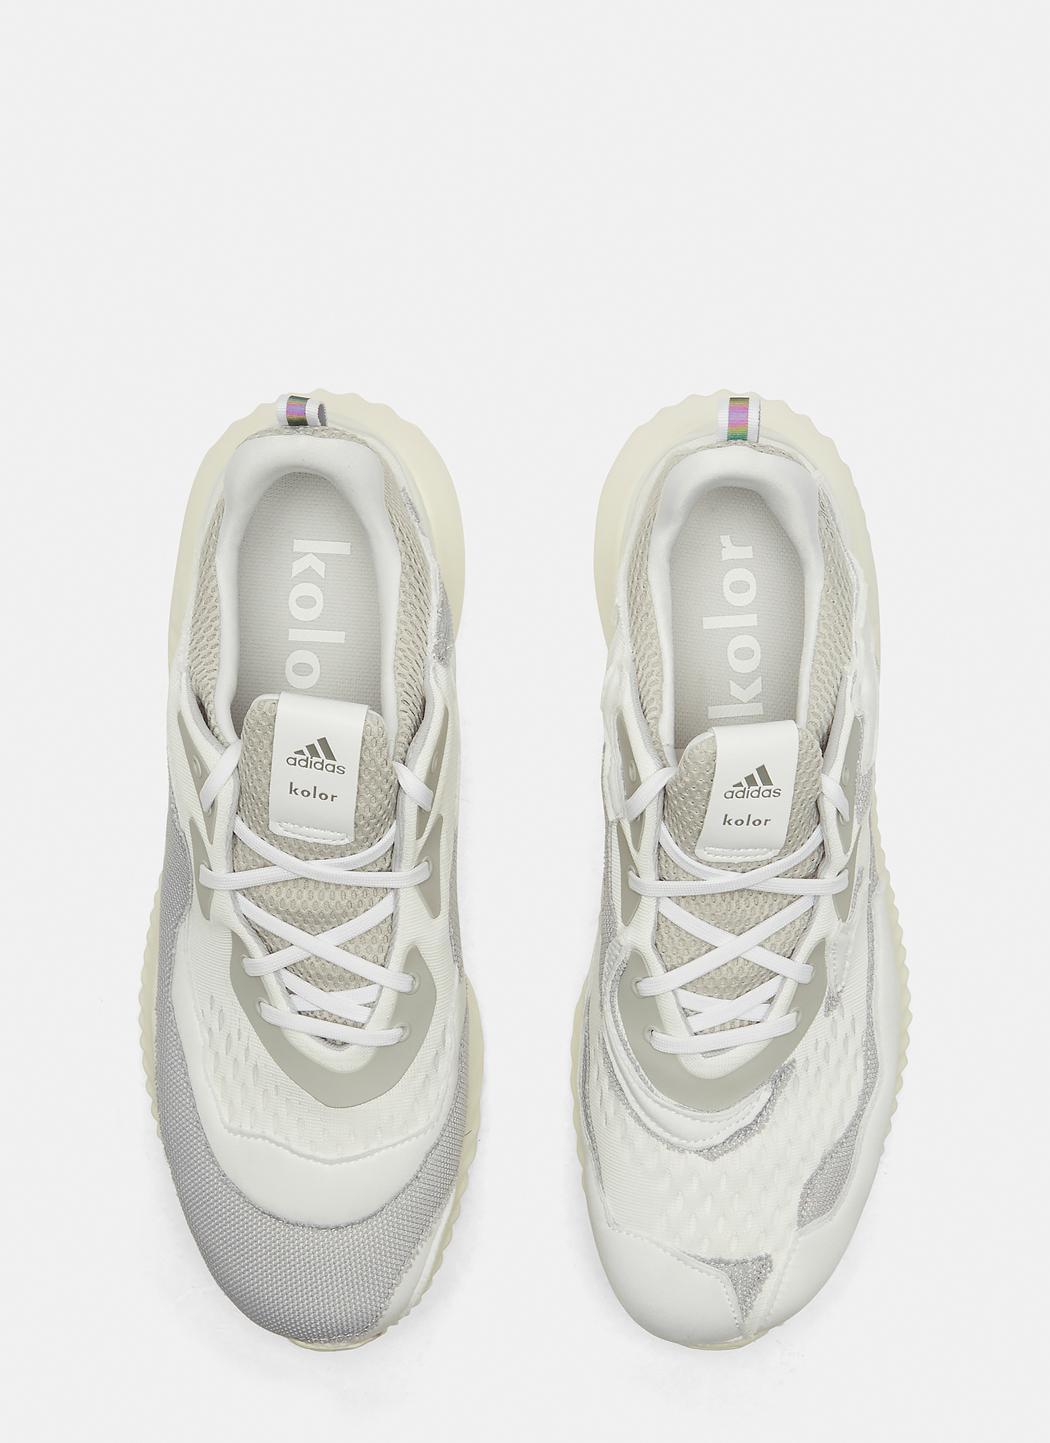 best website 986fb d1b1b Adidas Originals X Kolor Alpha Bounce Sneakers In White in W